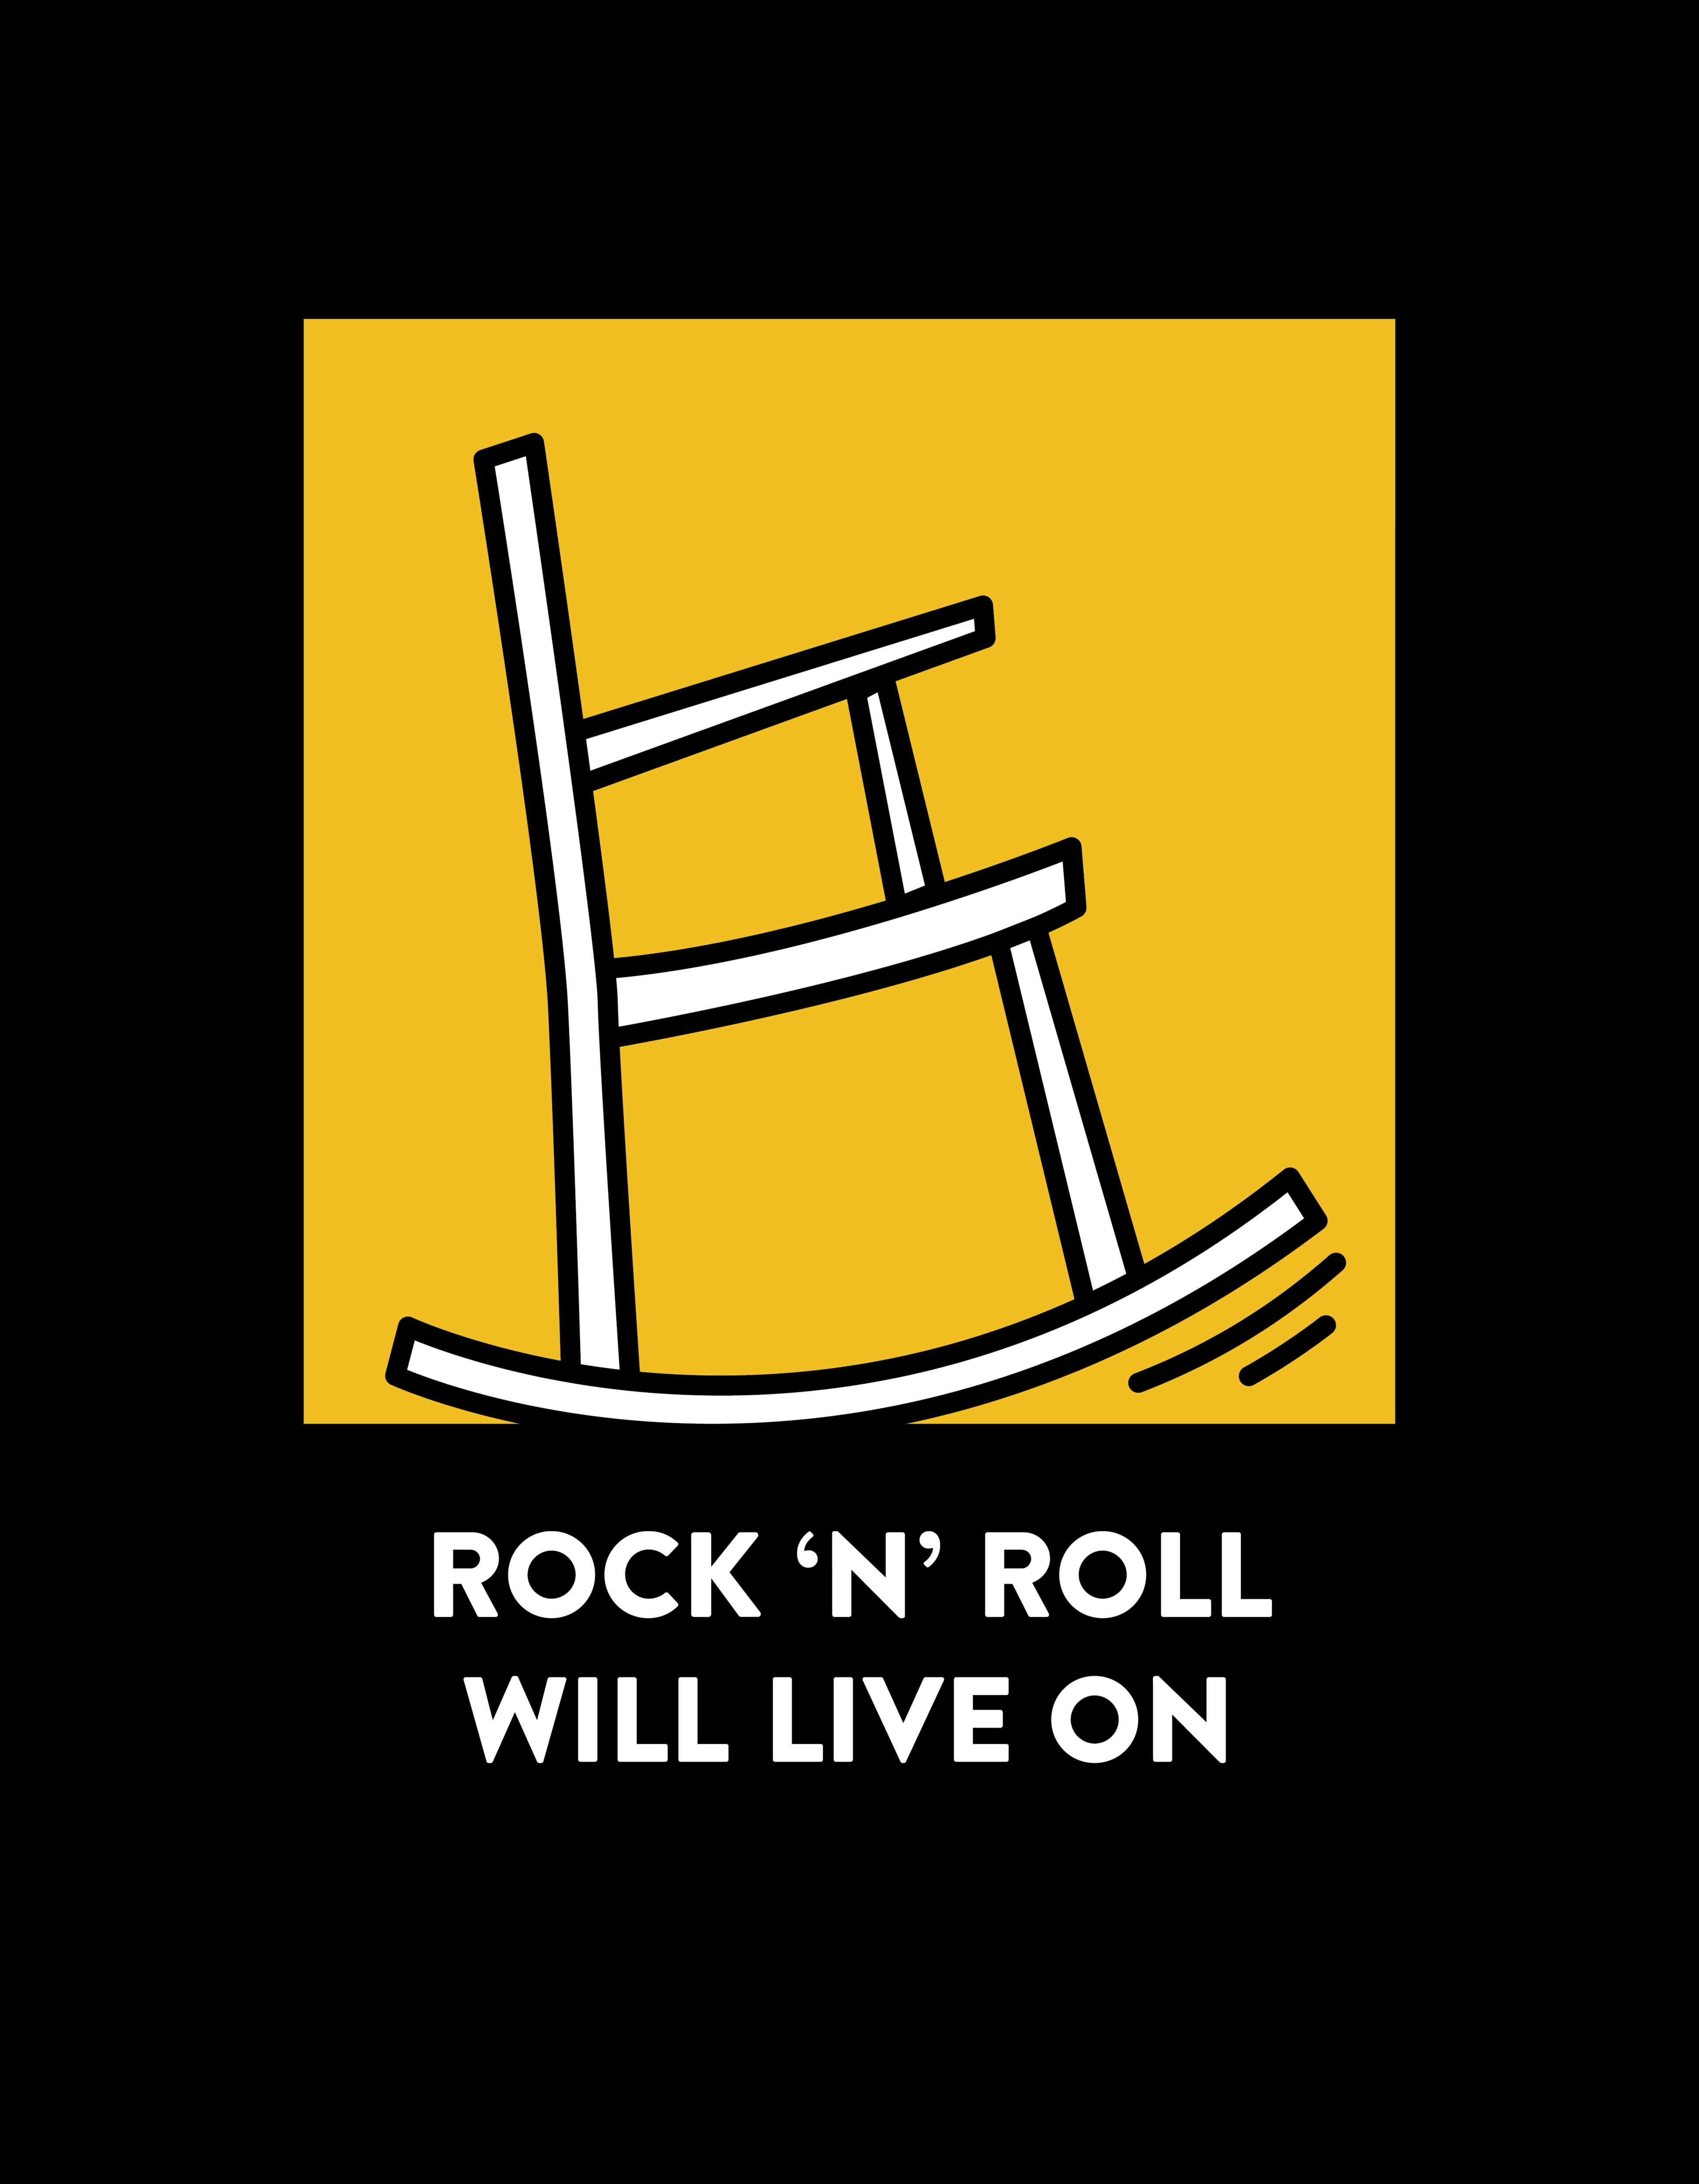 Rock n roll print social martynamakes copy 01